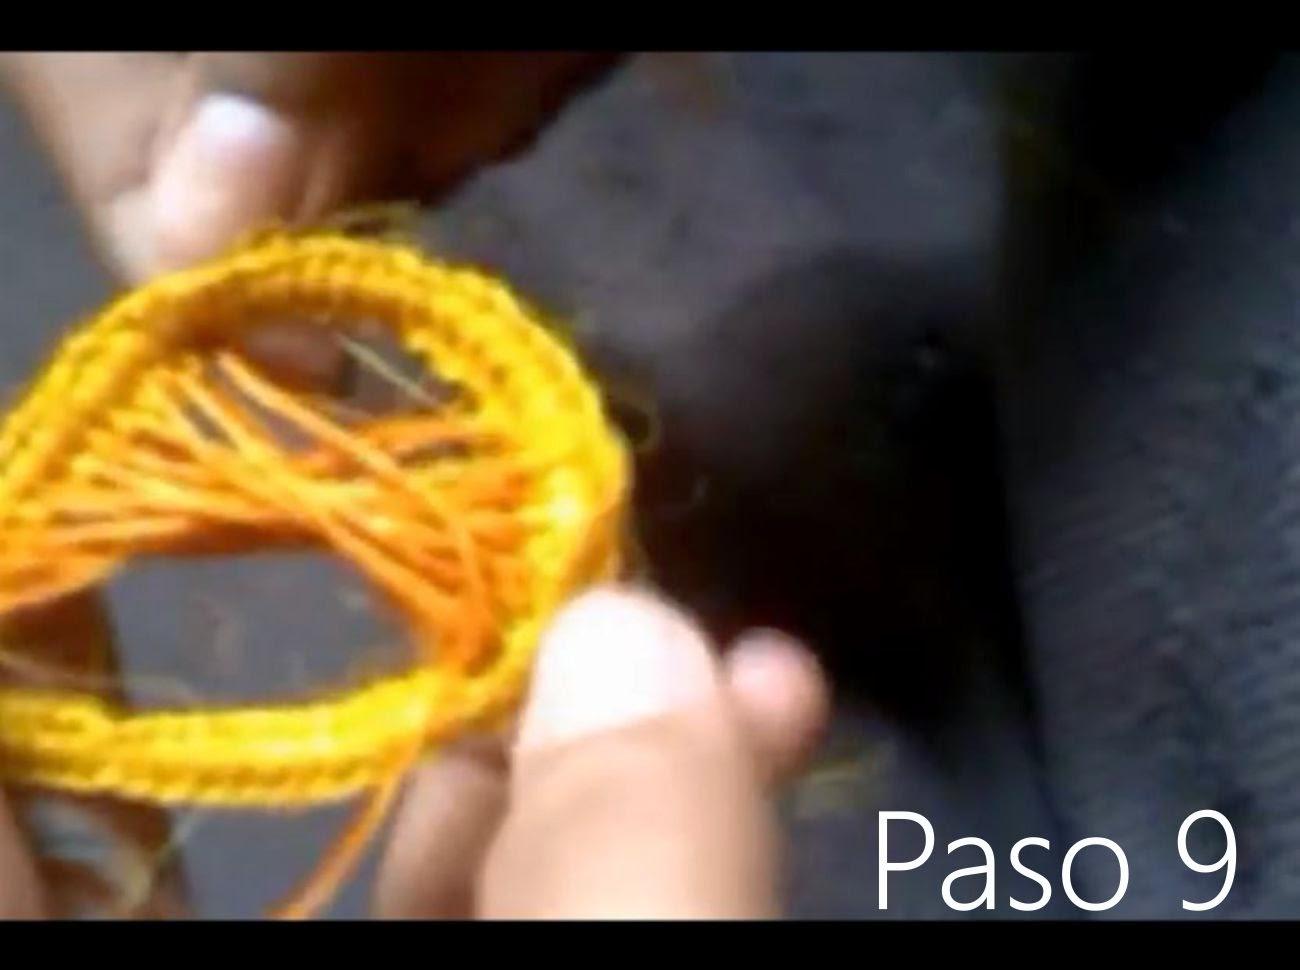 Llavero Lagrima Paso 9